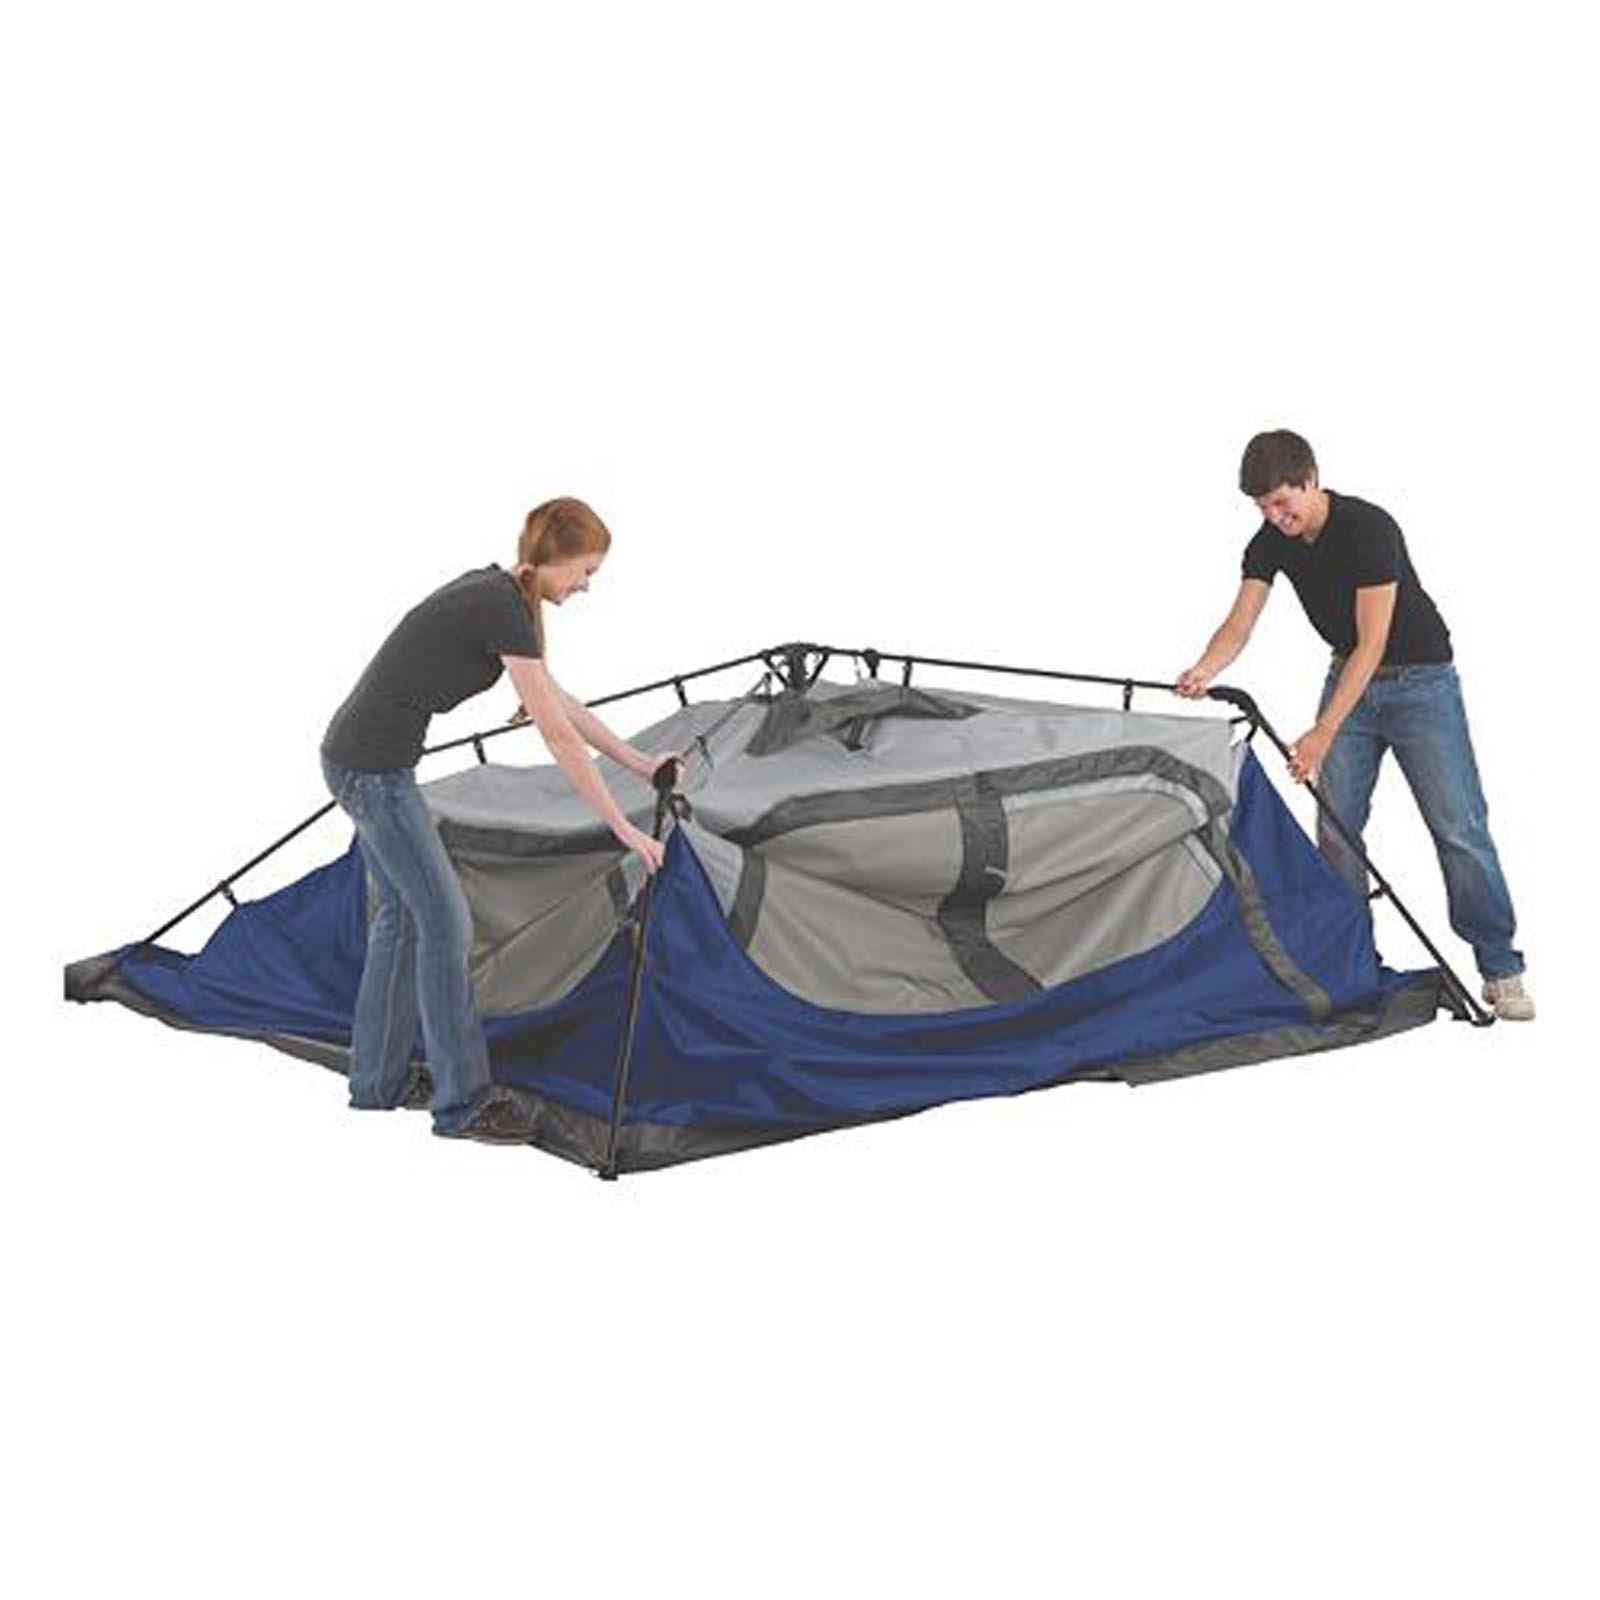 Coleman 6-Person Instant Tent Blue by Coleman (Image #4)